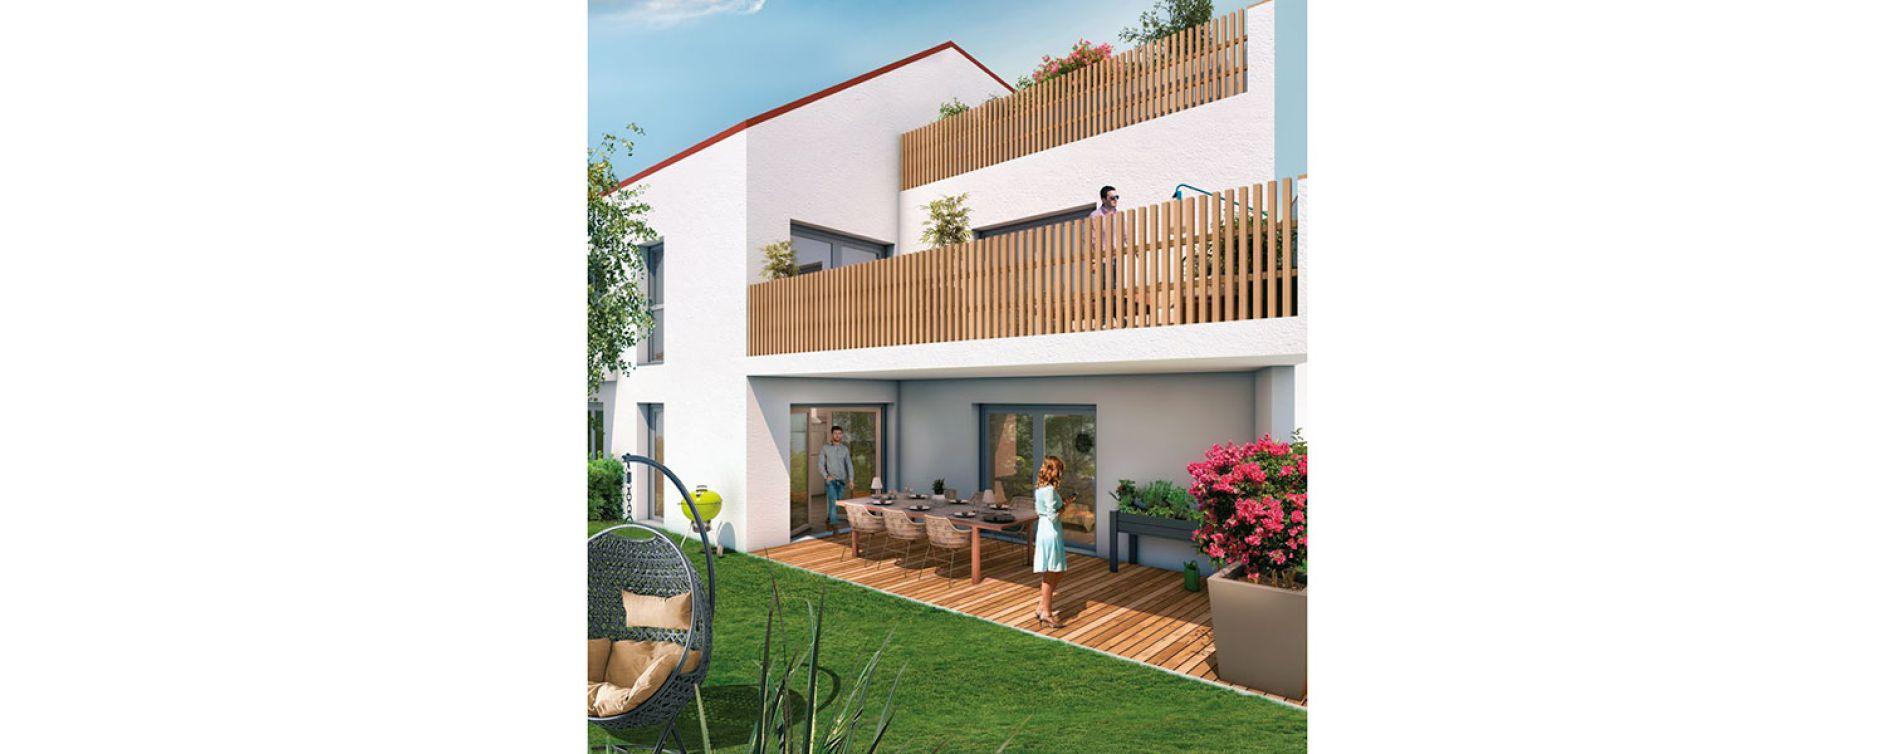 atlantis la rochelle programme immobilier neuf n 213098. Black Bedroom Furniture Sets. Home Design Ideas